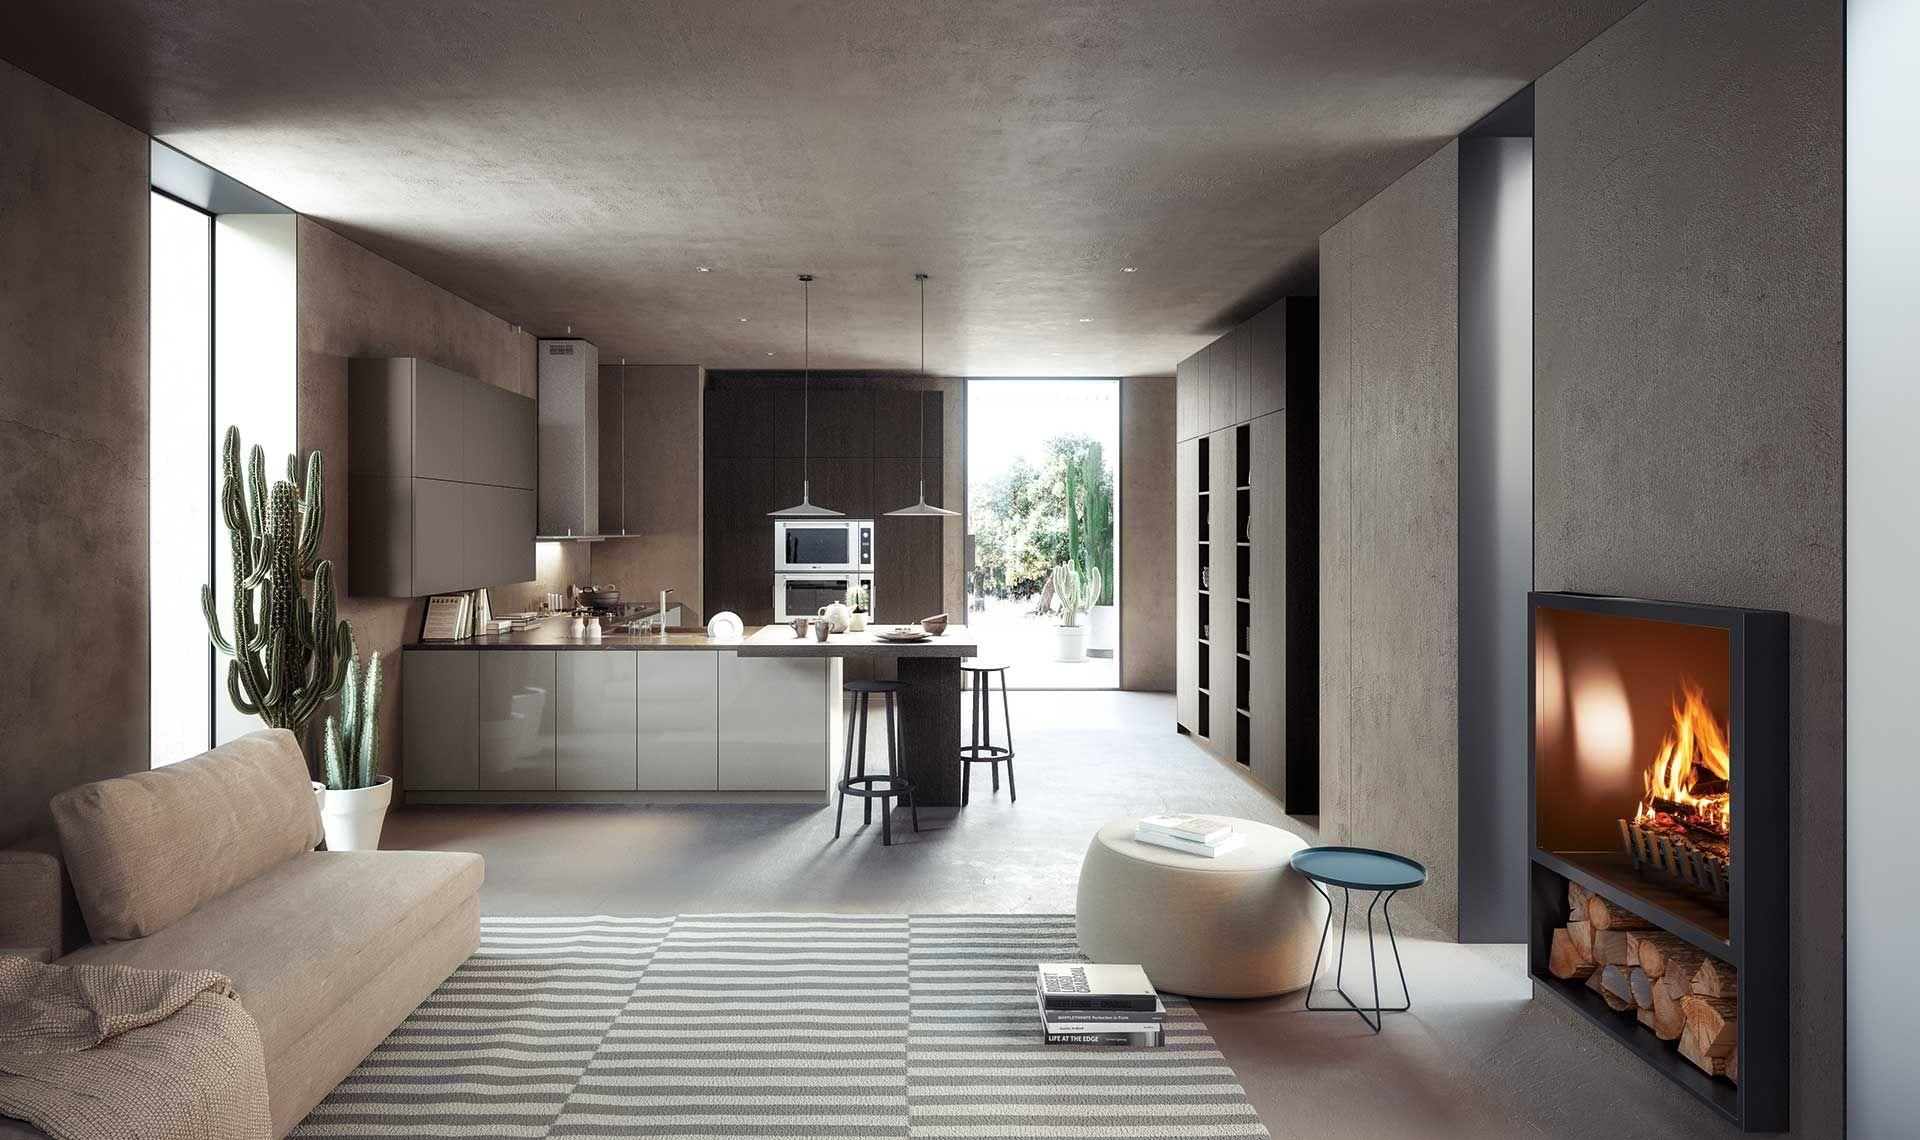 Cucine Open Space Moderne open space. la parola d'ordine nelle case più moderne. l